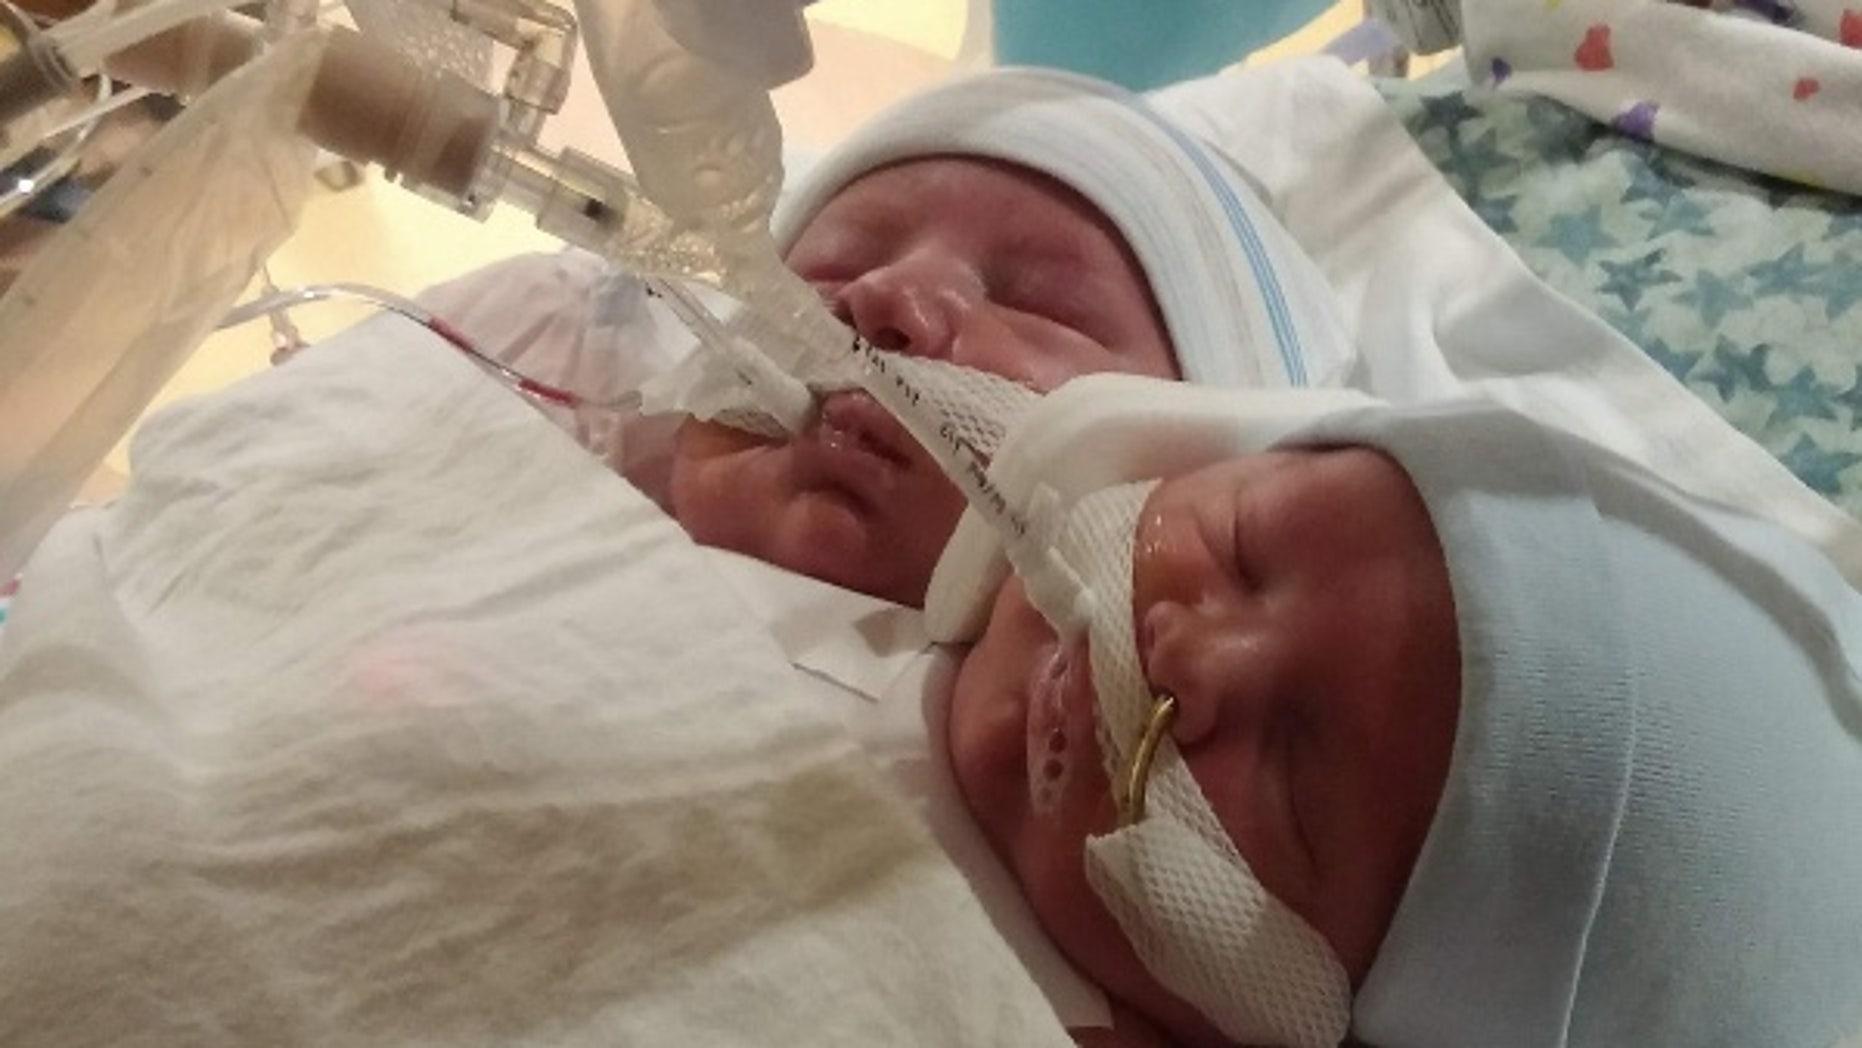 The Kroeger twins were born on Sept. 5 at Cincinnati Children's Hospital